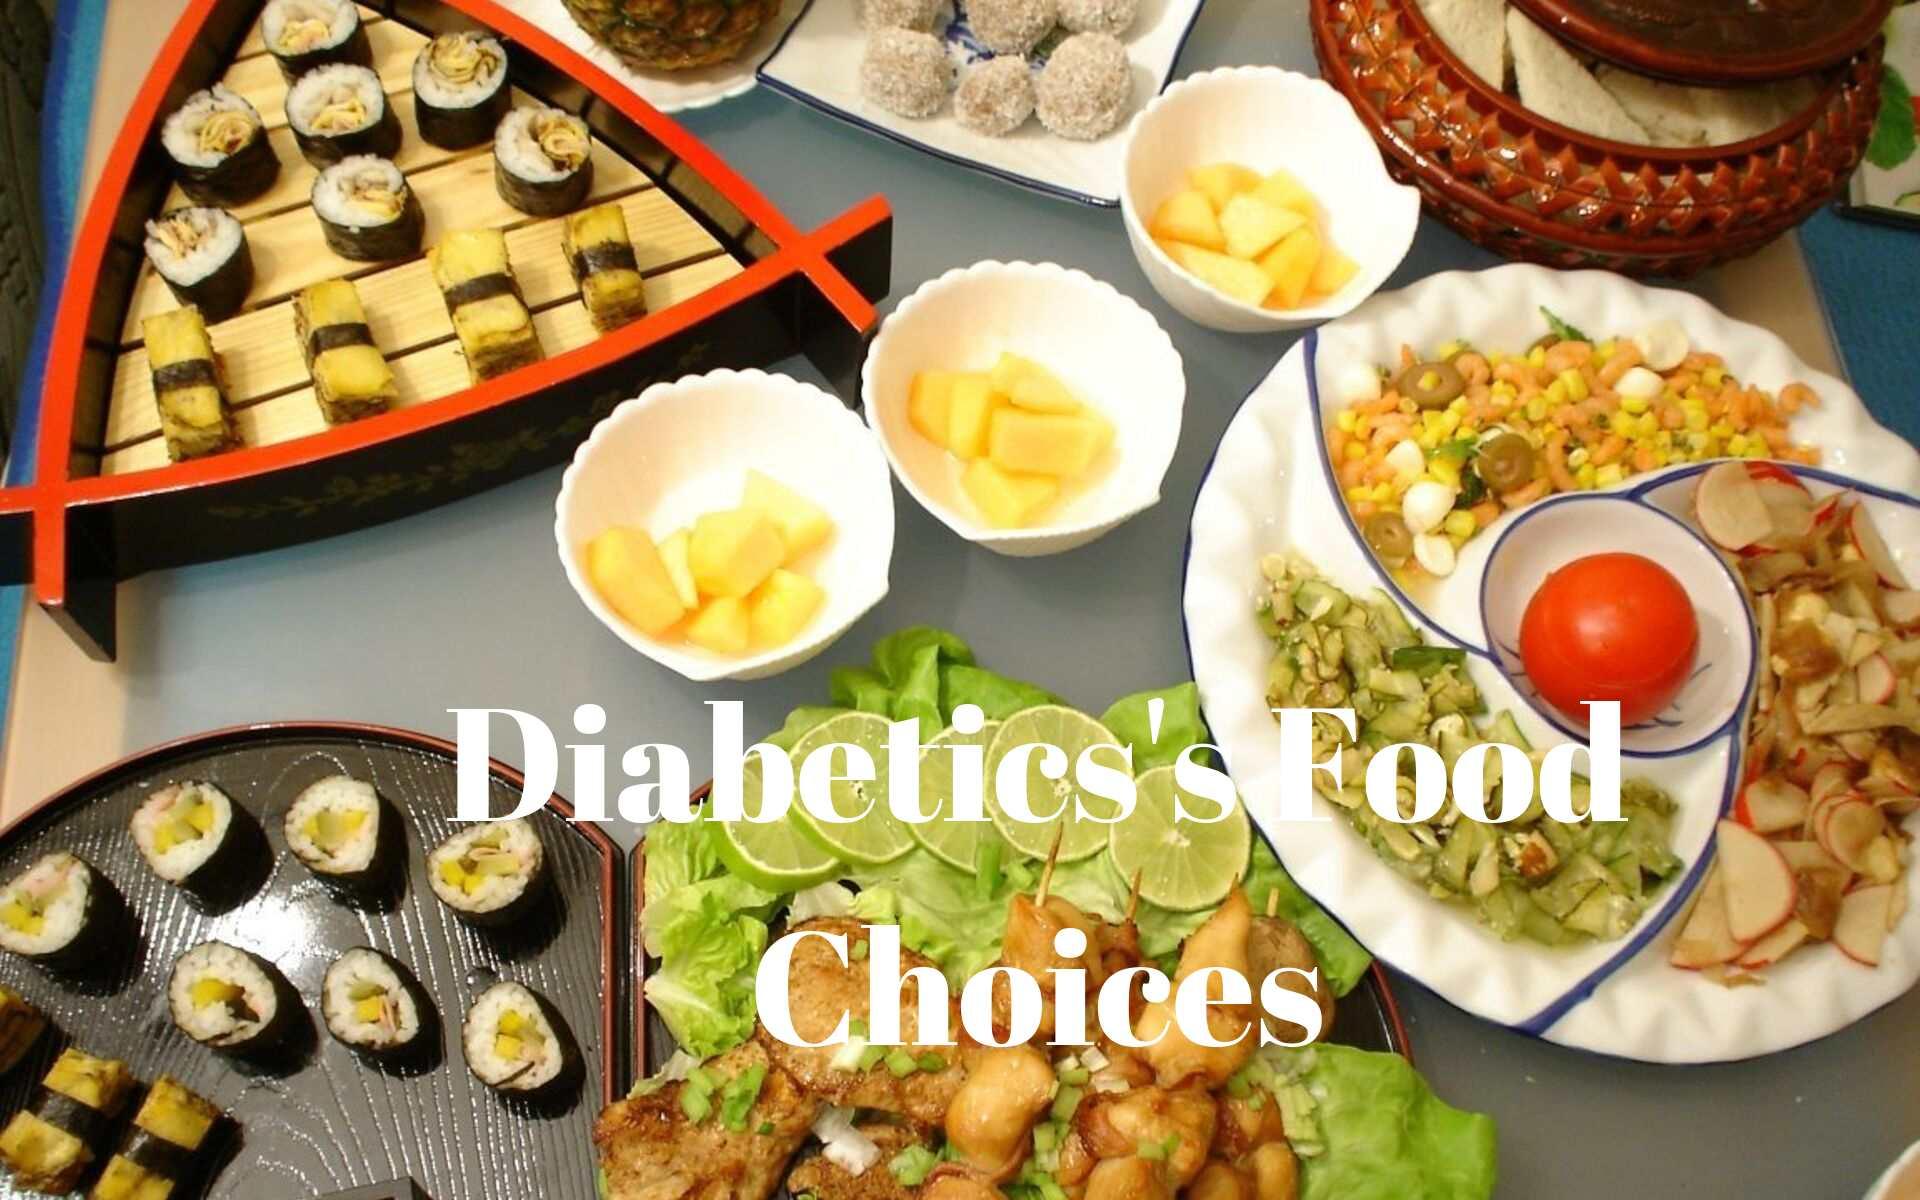 food options for diabetics